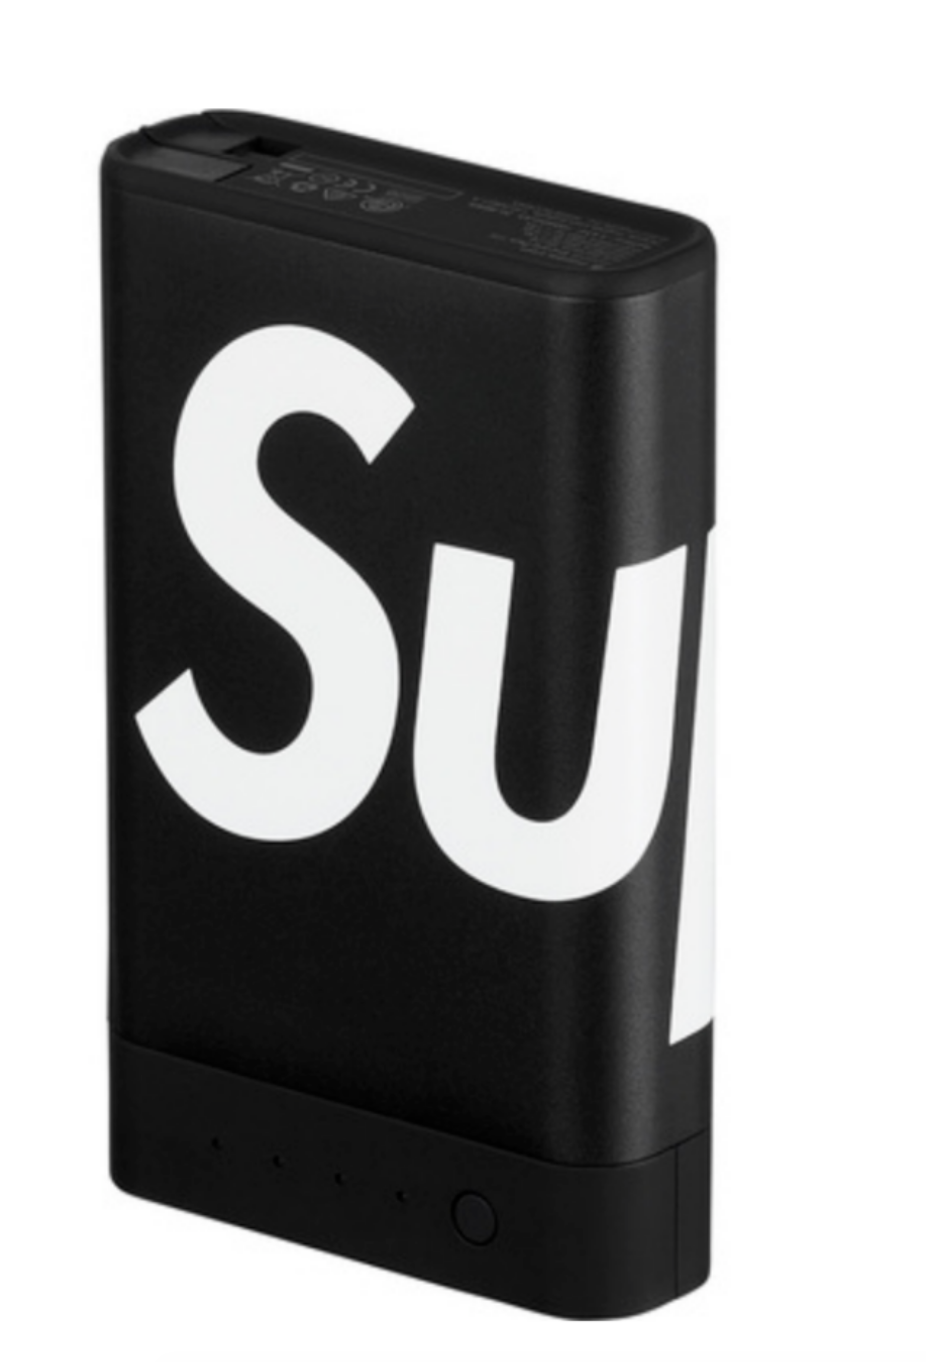 meet 5d216 2cd59 Supreme Mophie Encore Plus 10K Black | Supreme | Supreme, Portable ...